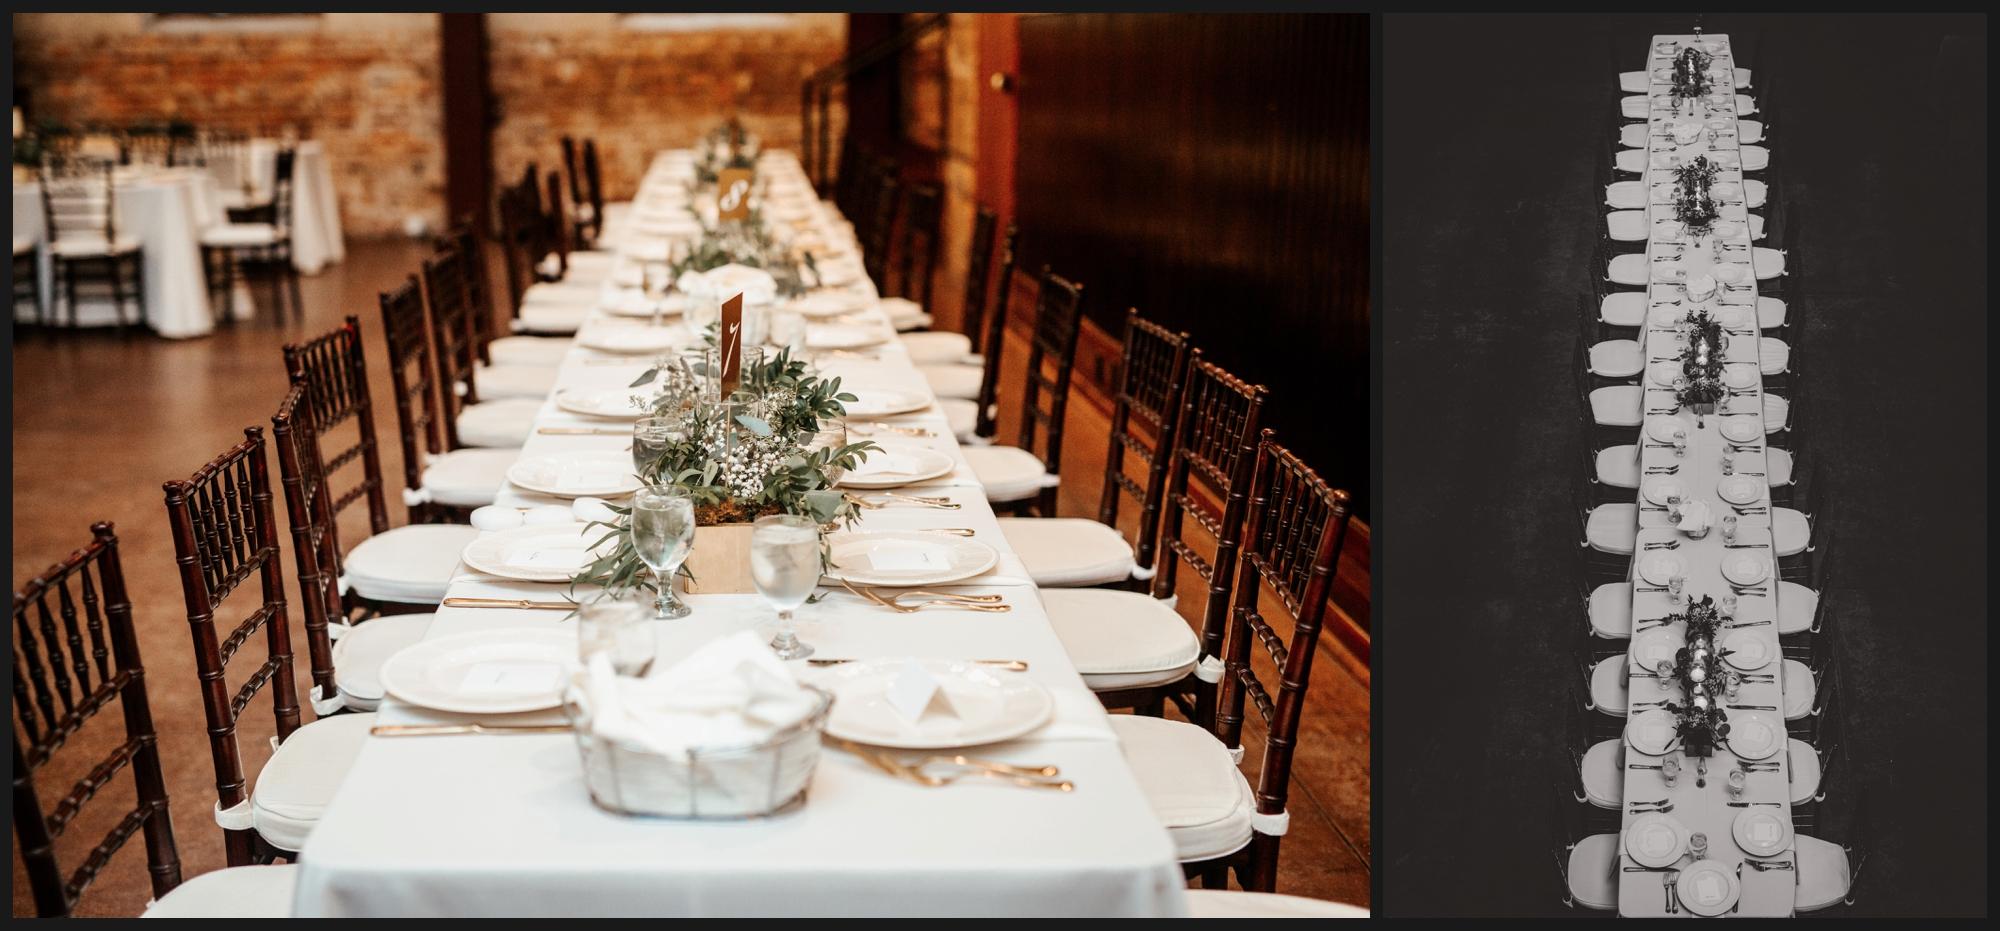 Orlando-Wedding-Photographer-destination-wedding-photographer-florida-wedding-photographer-bohemian-wedding-photographer_0566.jpg